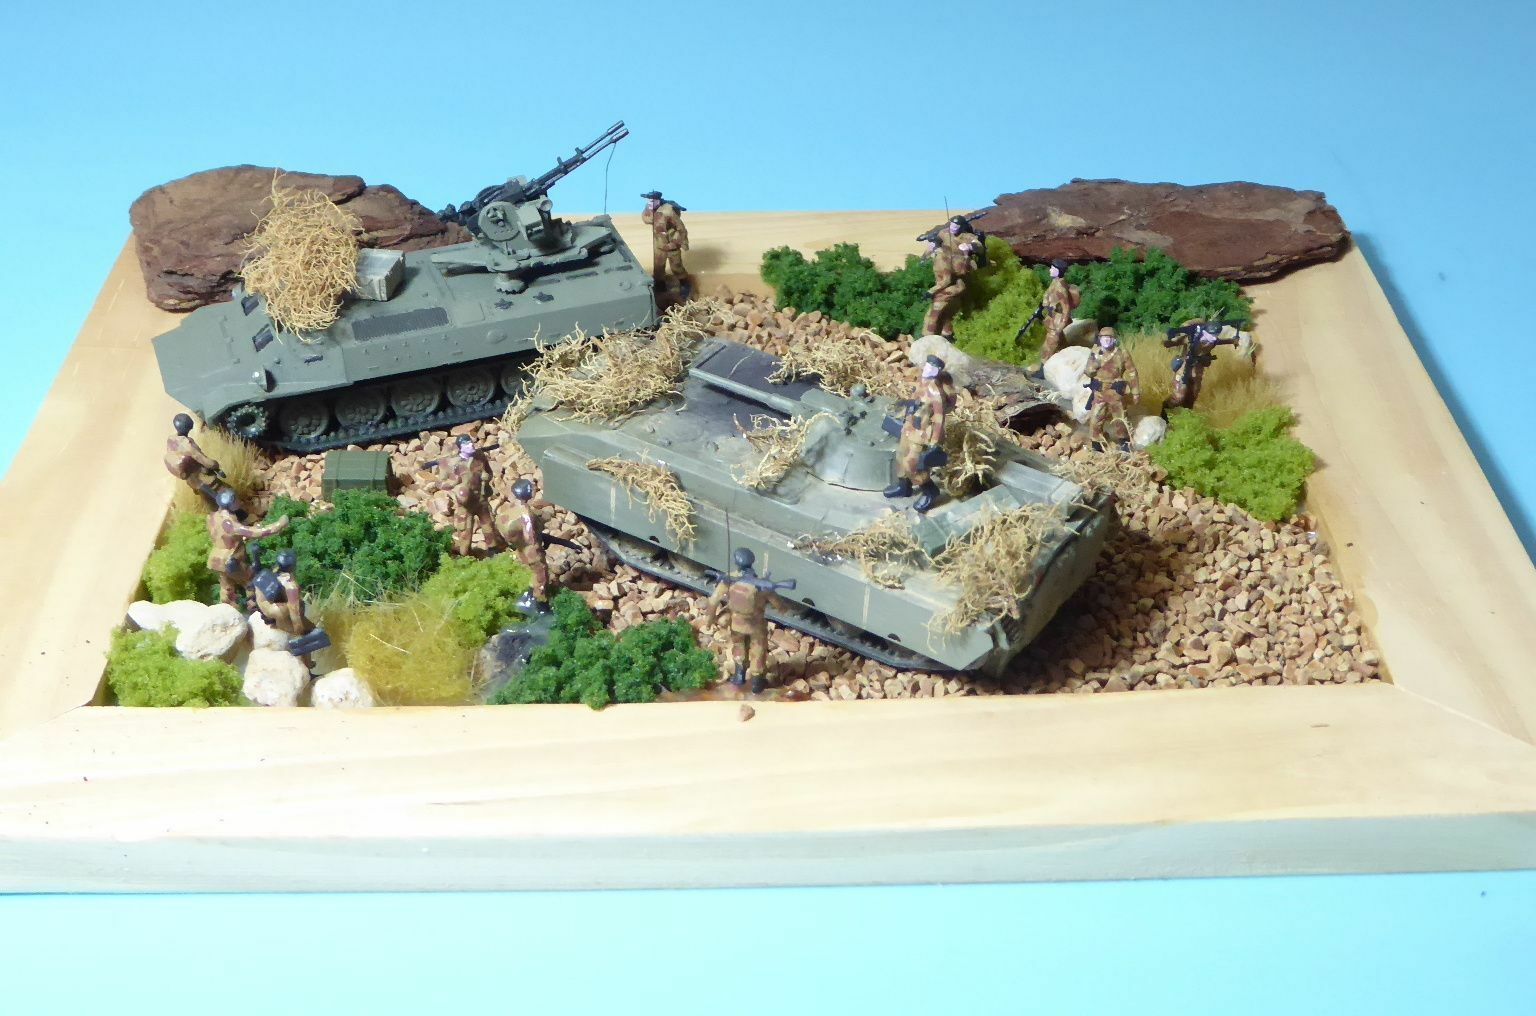 RK modelli diorama con 2 pezzi carri armati russi, militare 1 87 NVA, URSS 1 87 h0